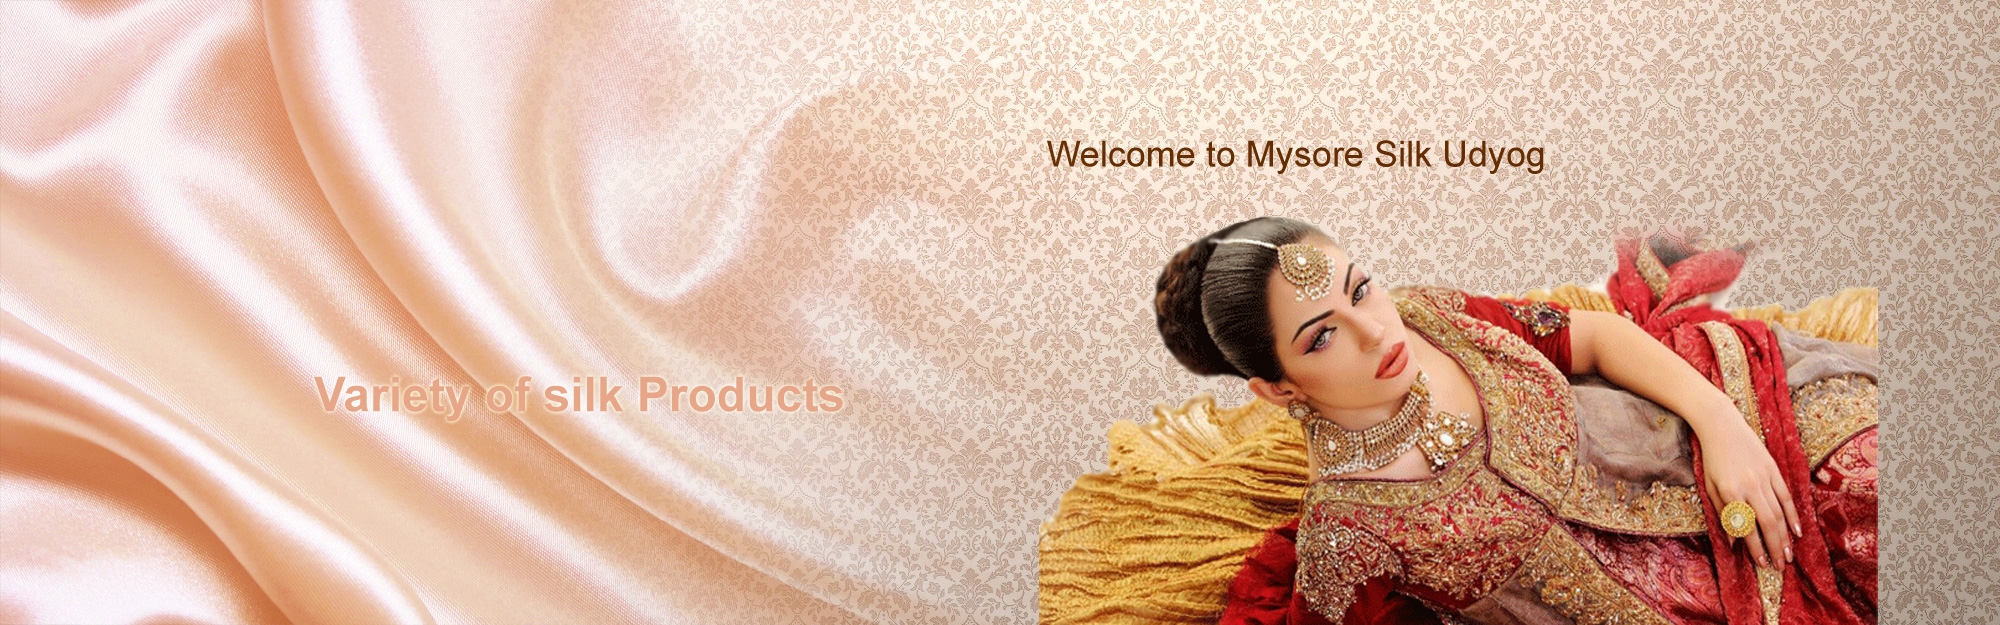 Welcome to Mysore Silk Udyog